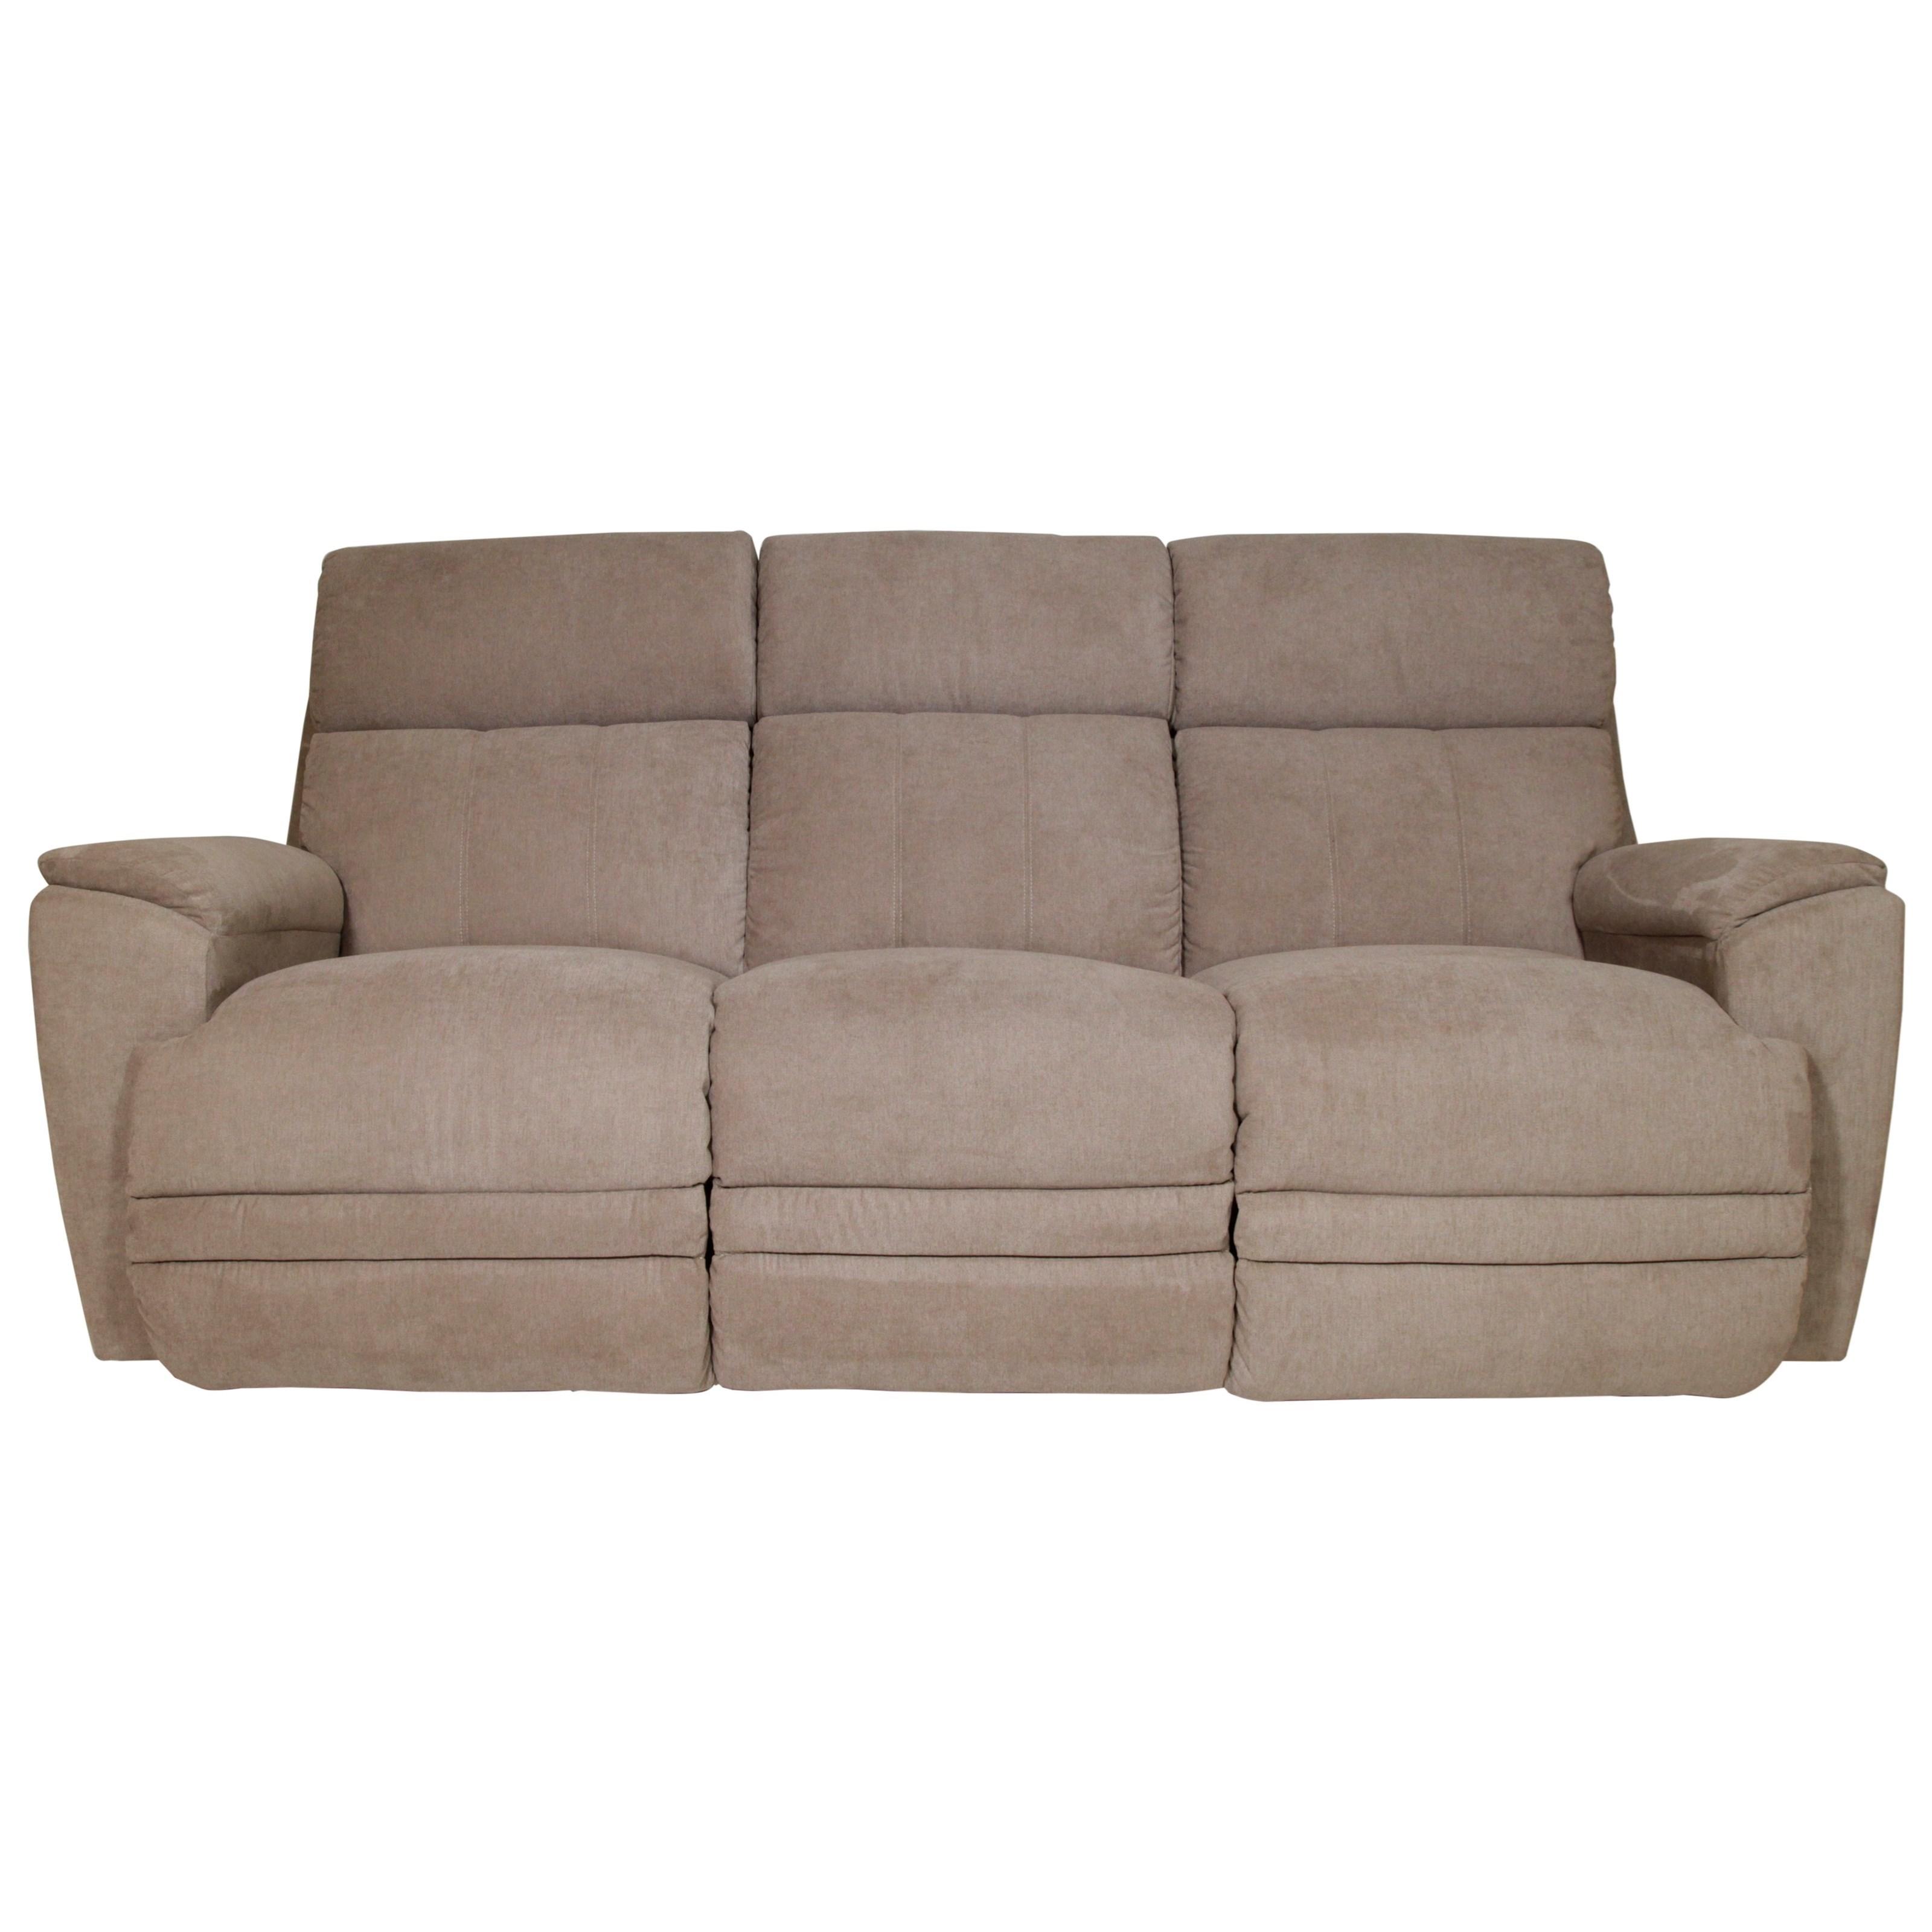 Talladega Power Reclining Sofa by La-Z-Boy at HomeWorld Furniture